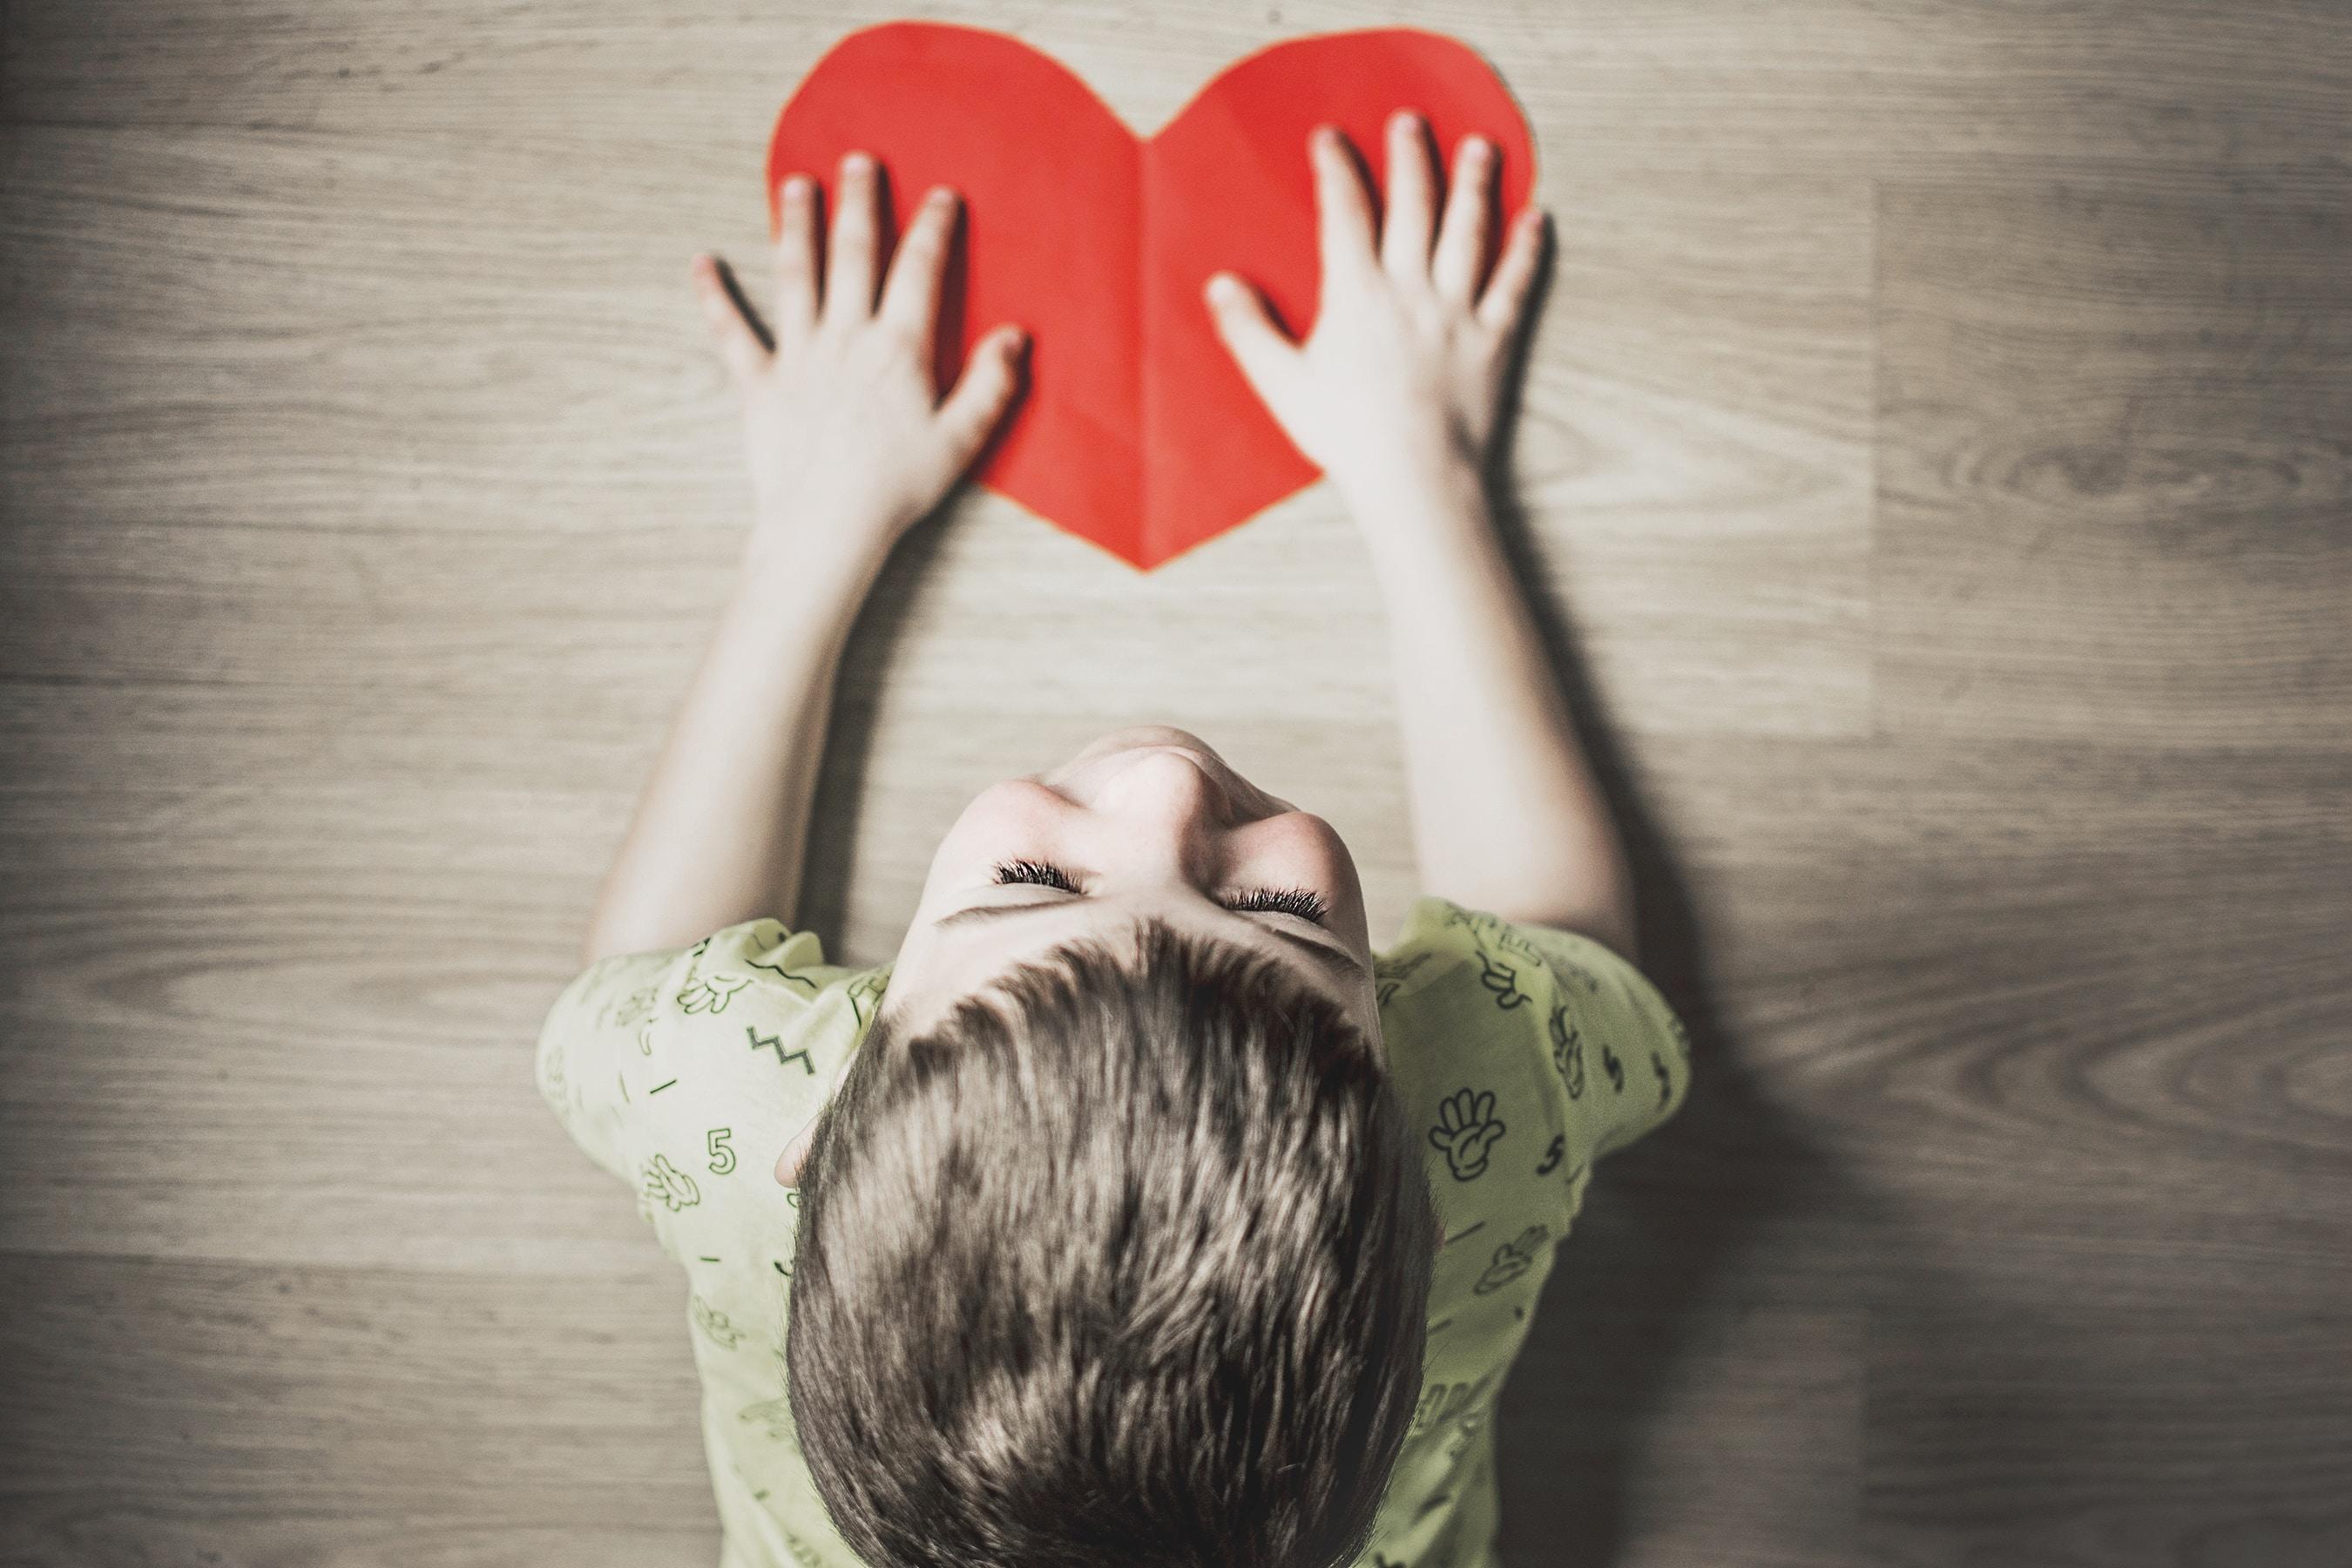 childish description #feelings #child #poetry stories